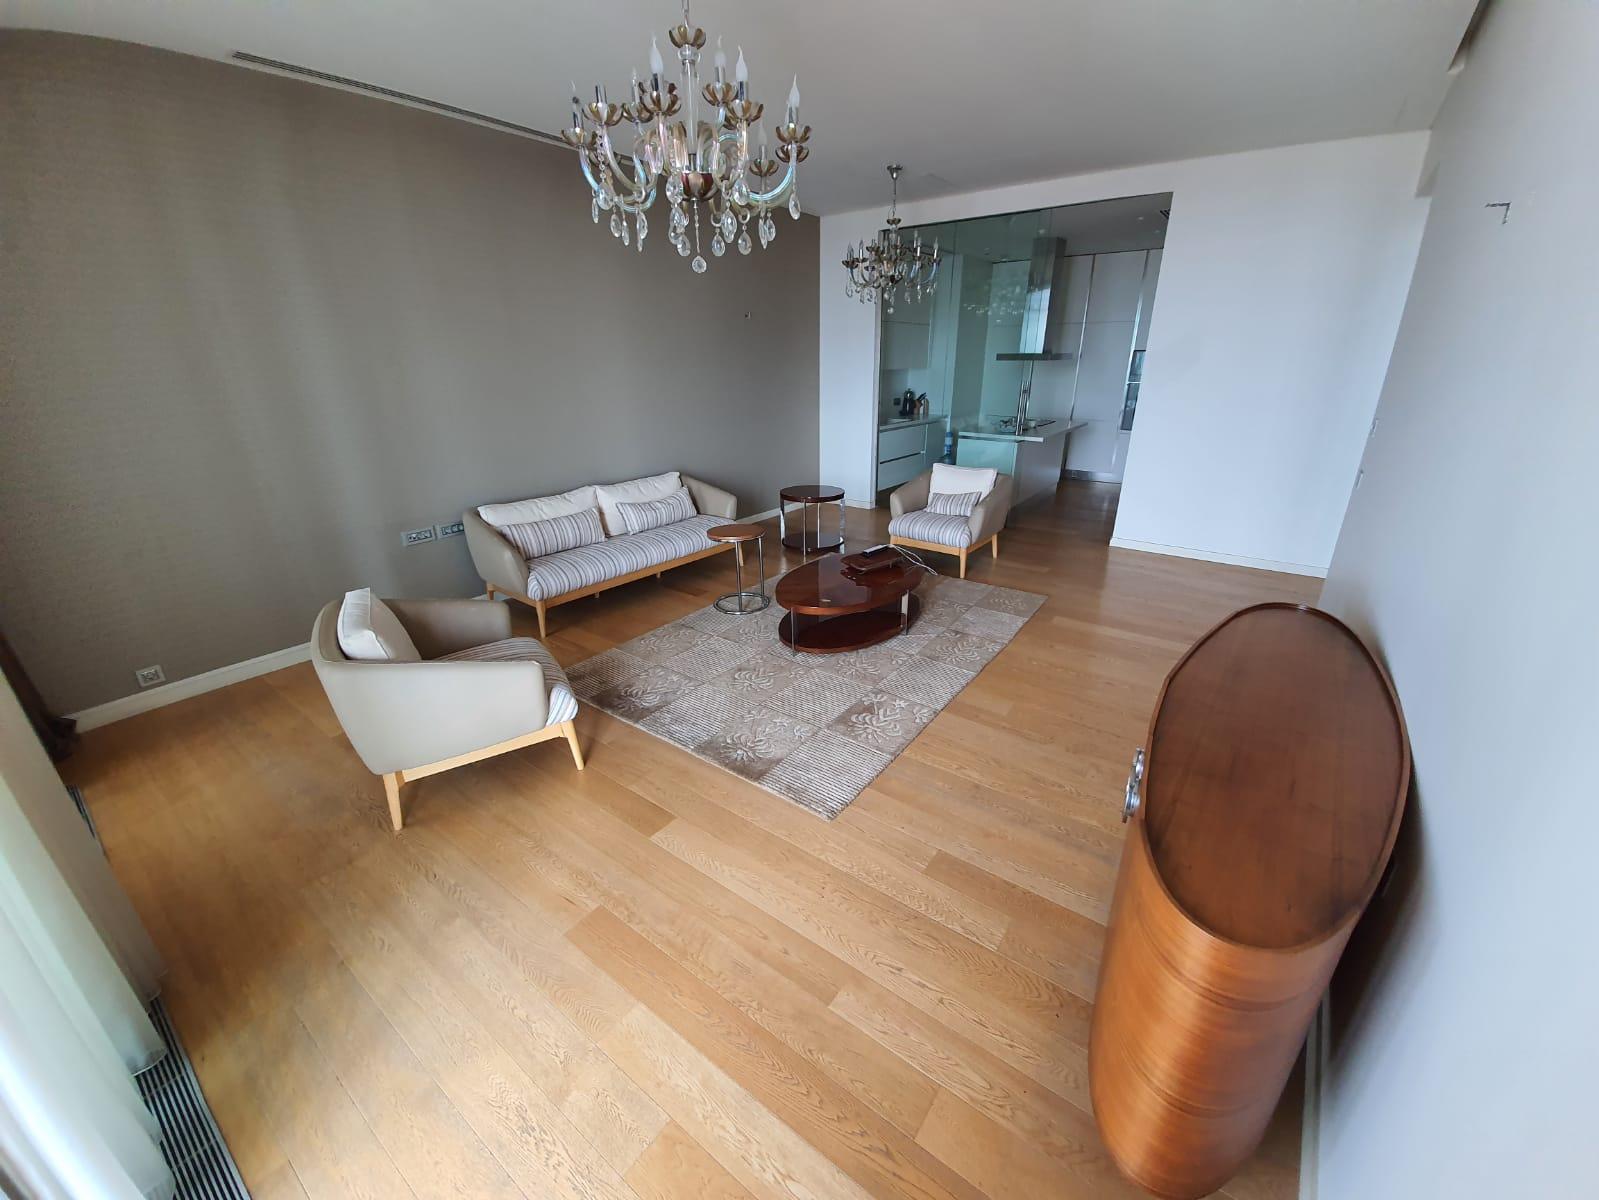 apartments-residence-sapphire-tower-11th-floor-004.jpg